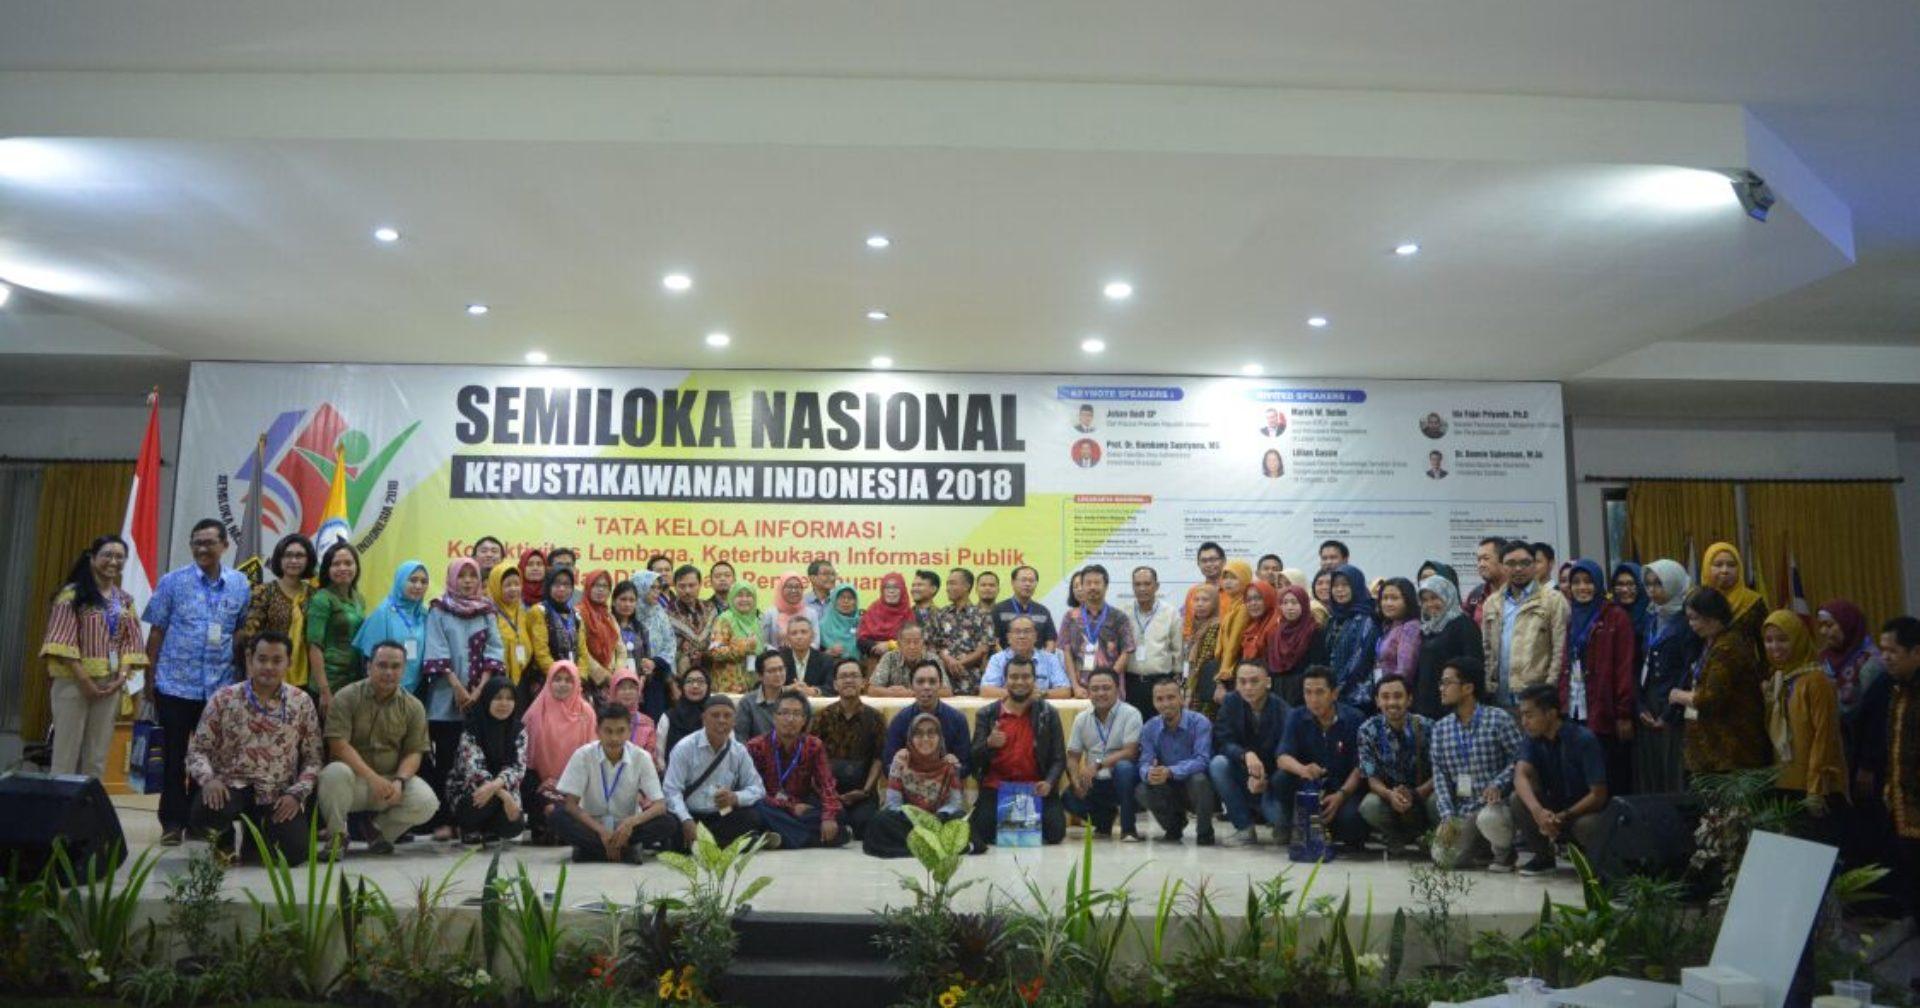 SEMILOKA NASIONAL KEPUSTAKAWANAN INDONESIA V & SNIPer 2019